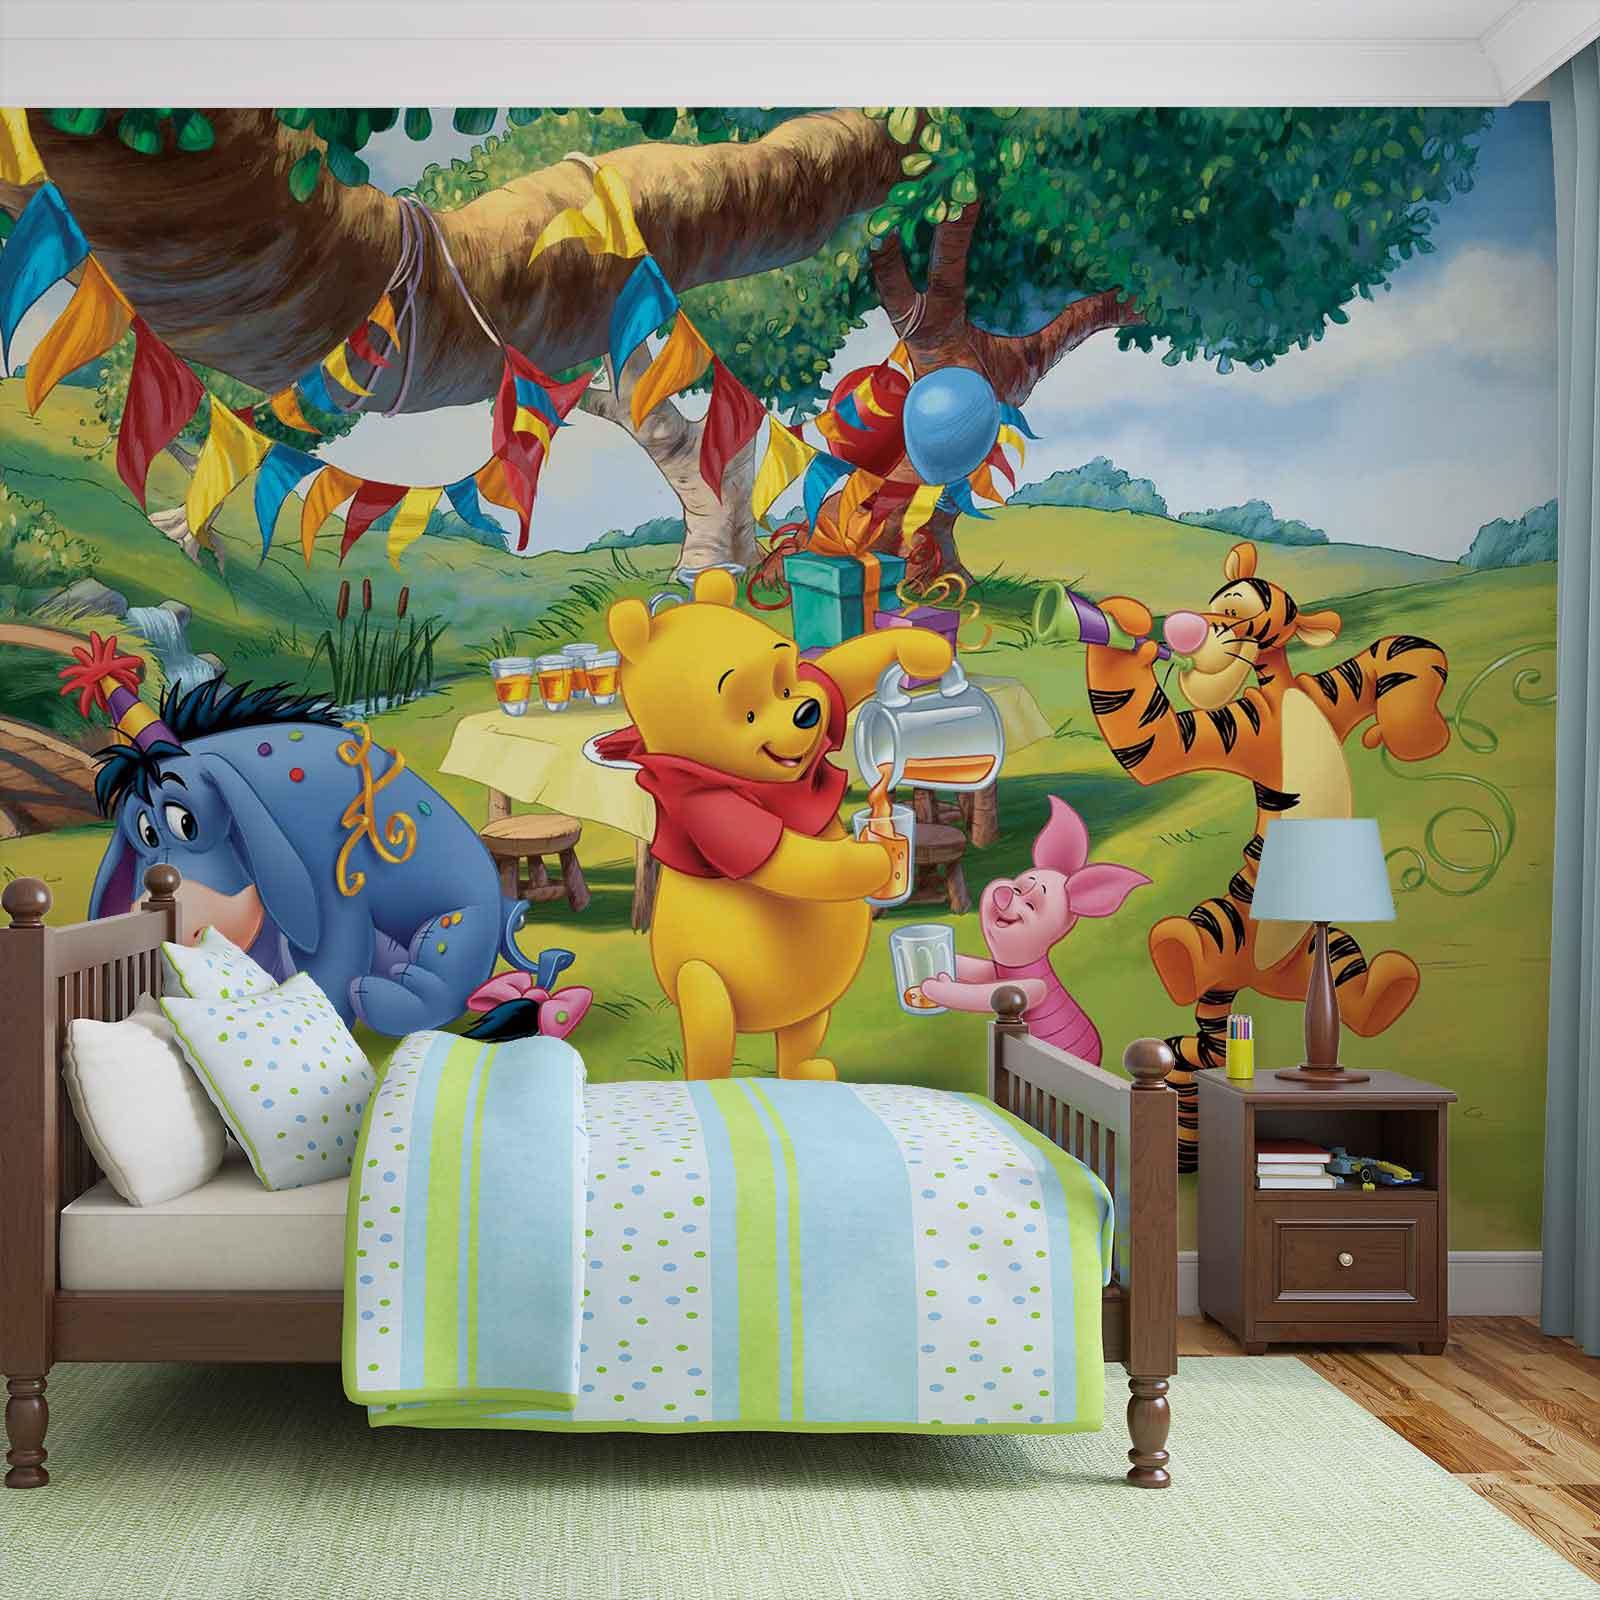 fototapete disney winnie pu b r ferkel tiger i aah vliestapete 3173wm. Black Bedroom Furniture Sets. Home Design Ideas